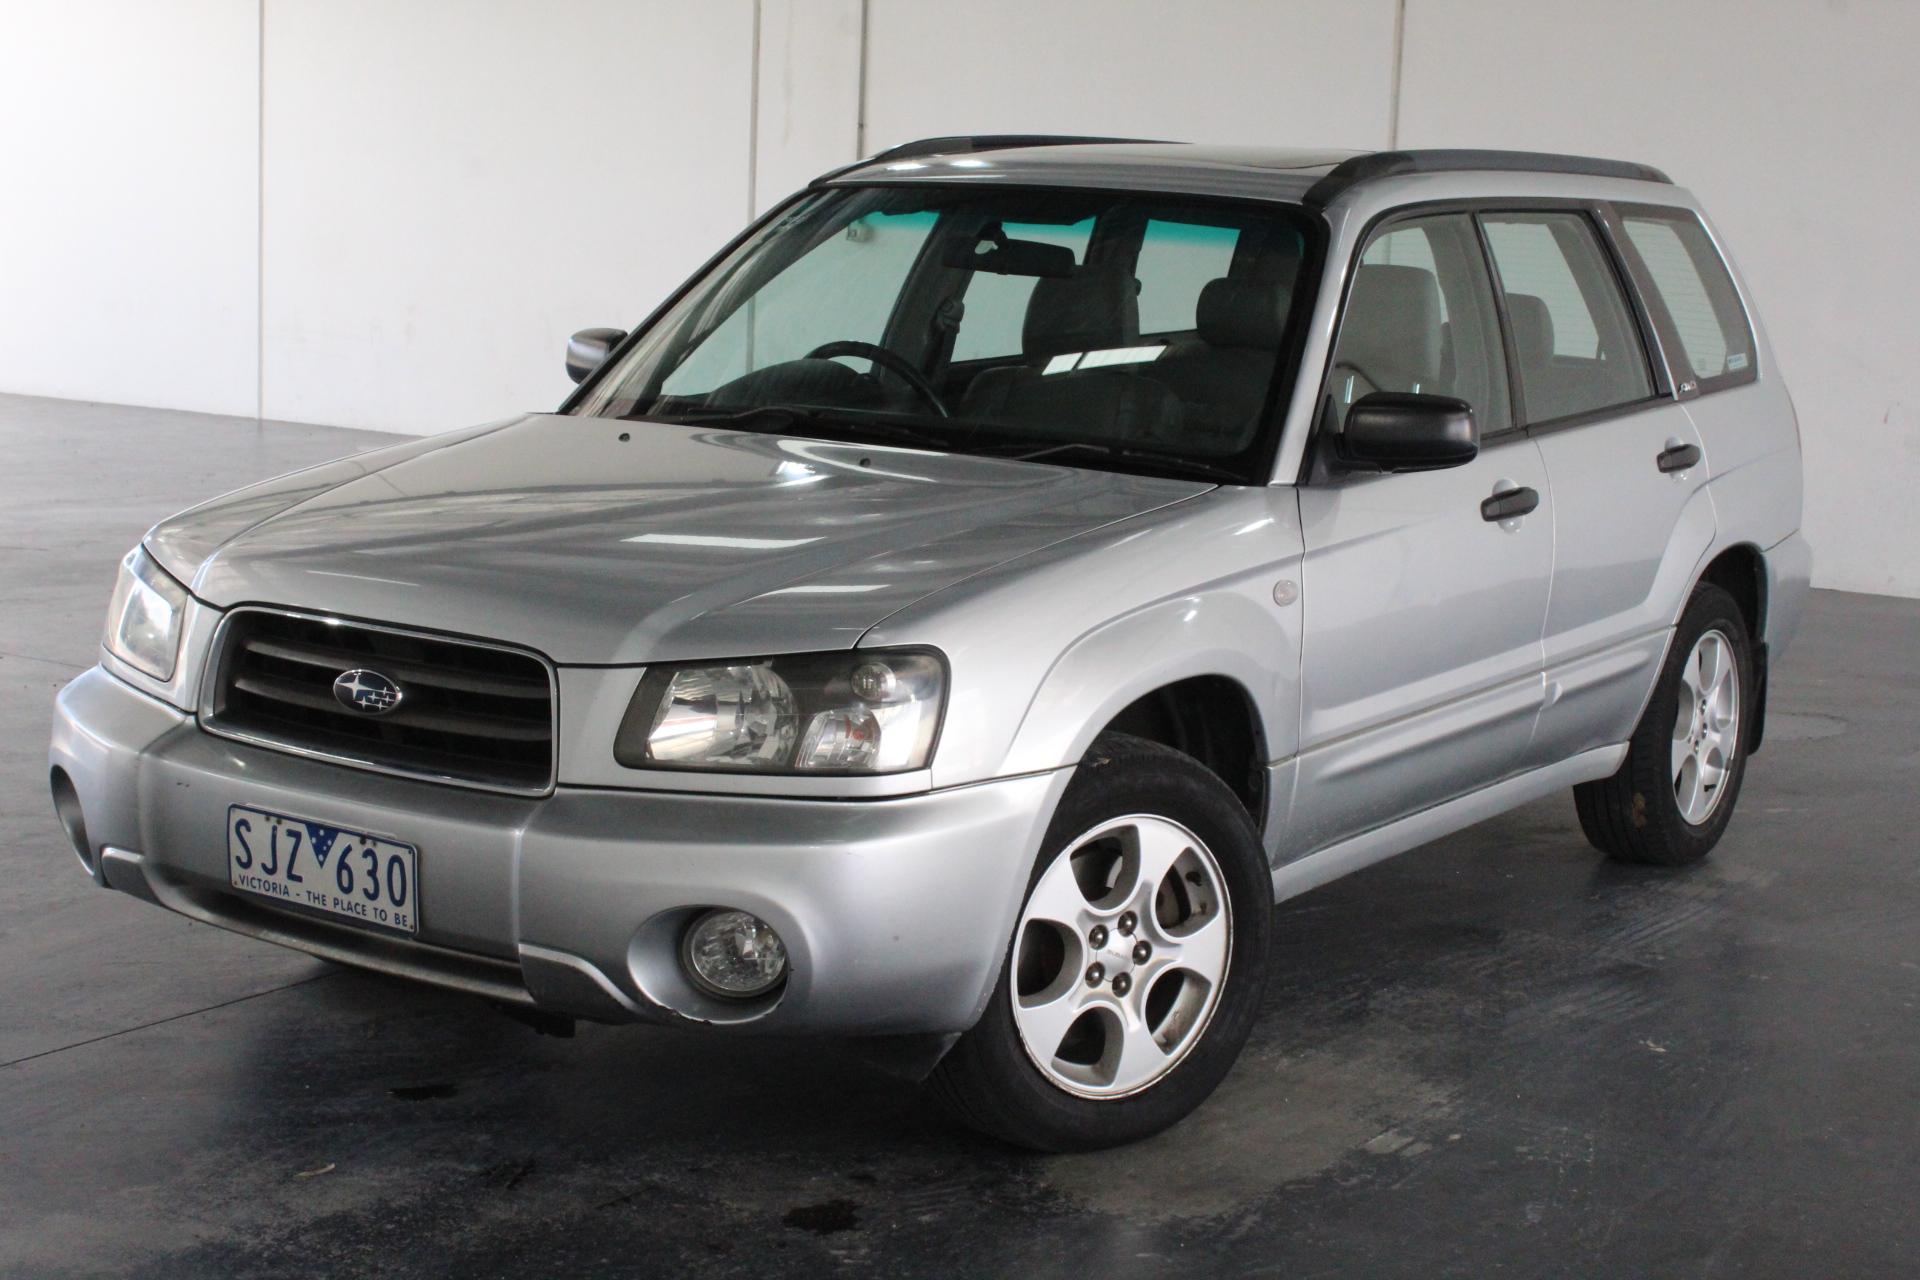 2003 Subaru Forester XS Luxury Automatic Wagon